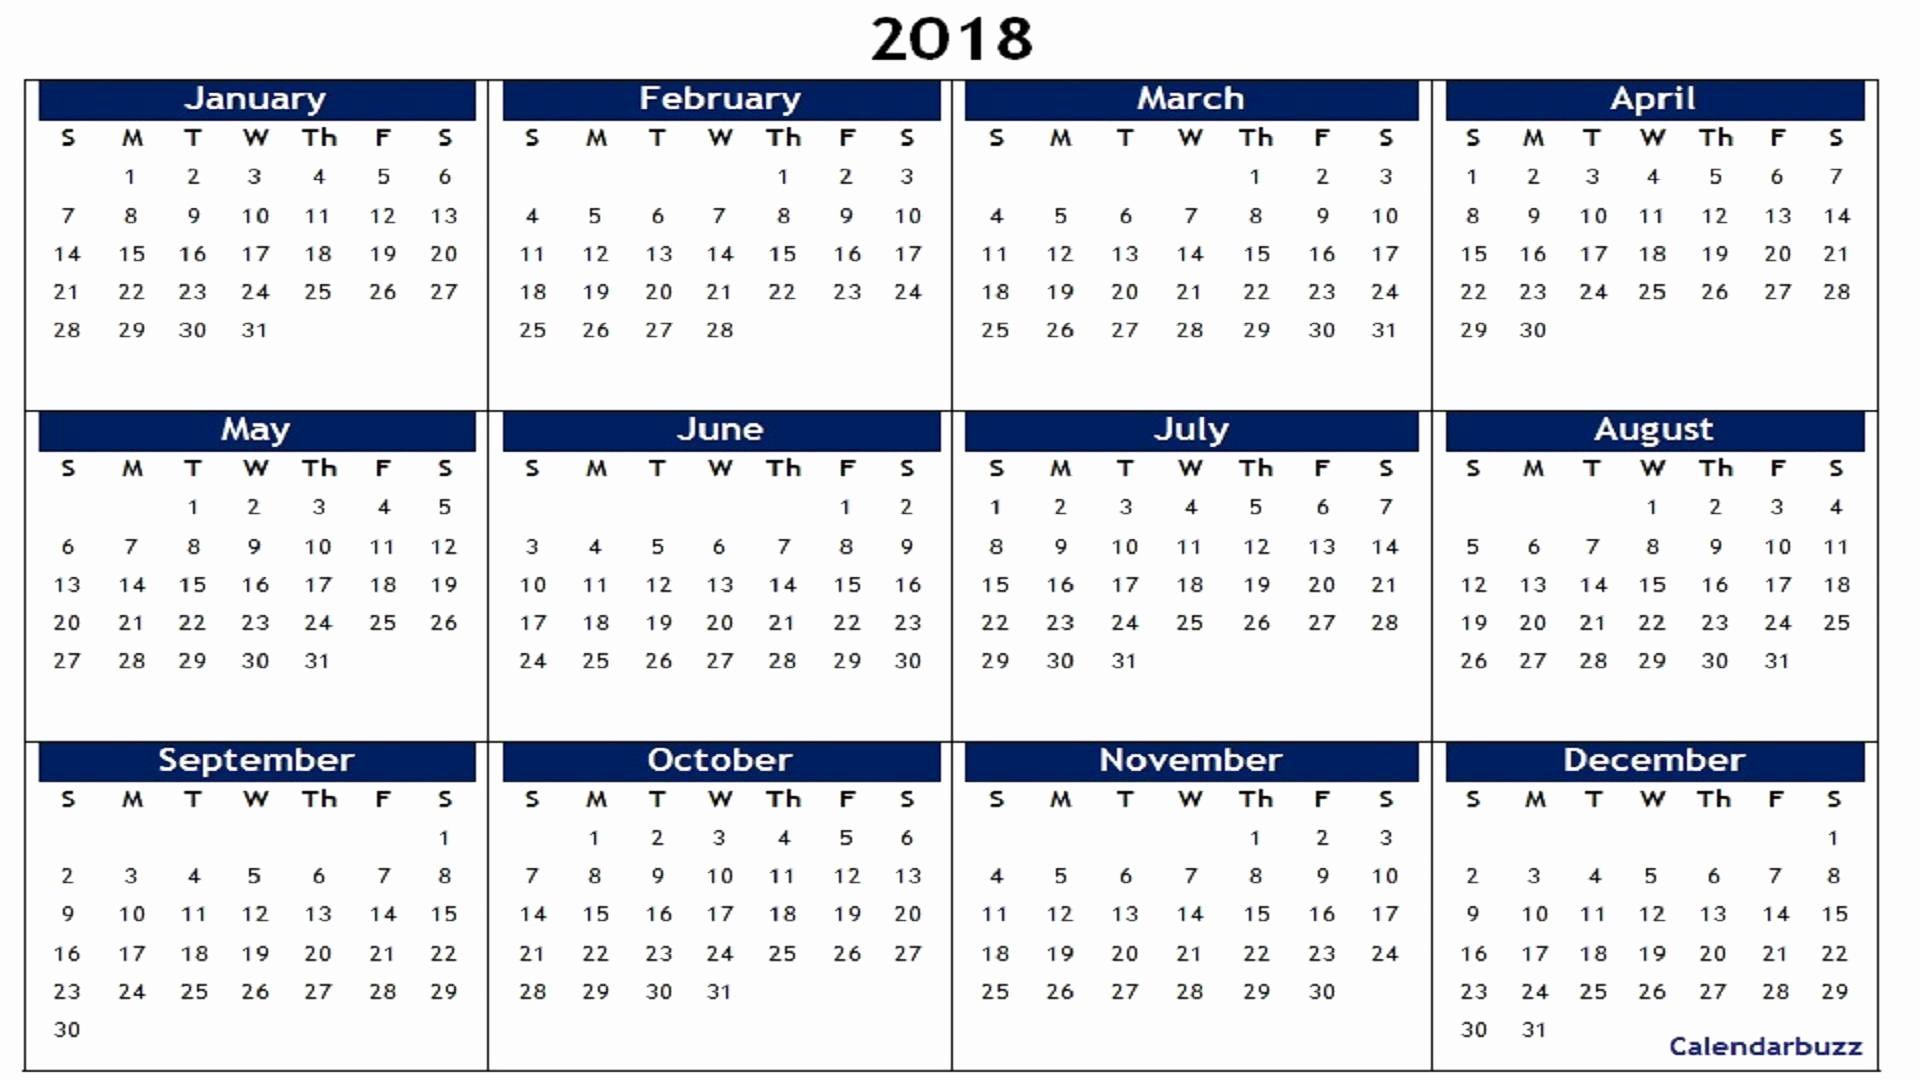 Free Printable Calendar 2018 In 2020 Calendar Printables Printable Calendar Design Weekly Calendar Template